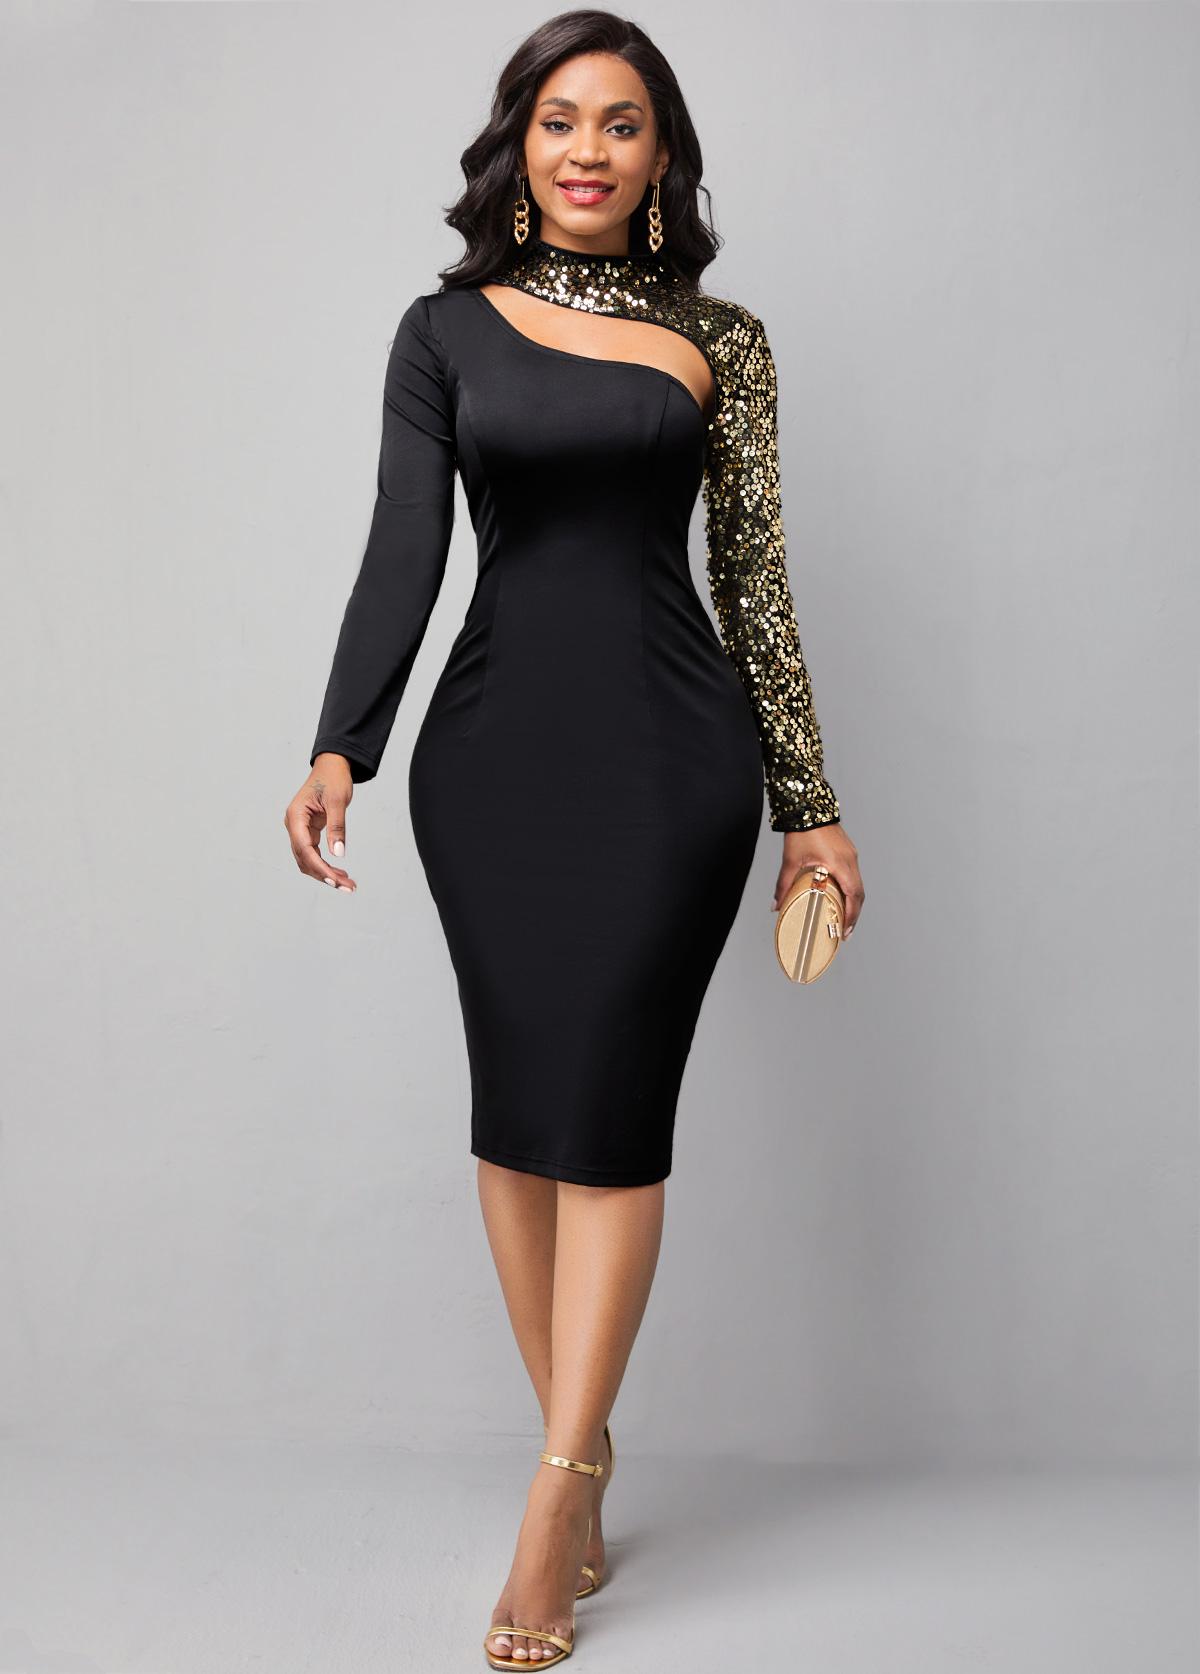 ROTITA Cutout Front Sequin Long Sleeve Dress